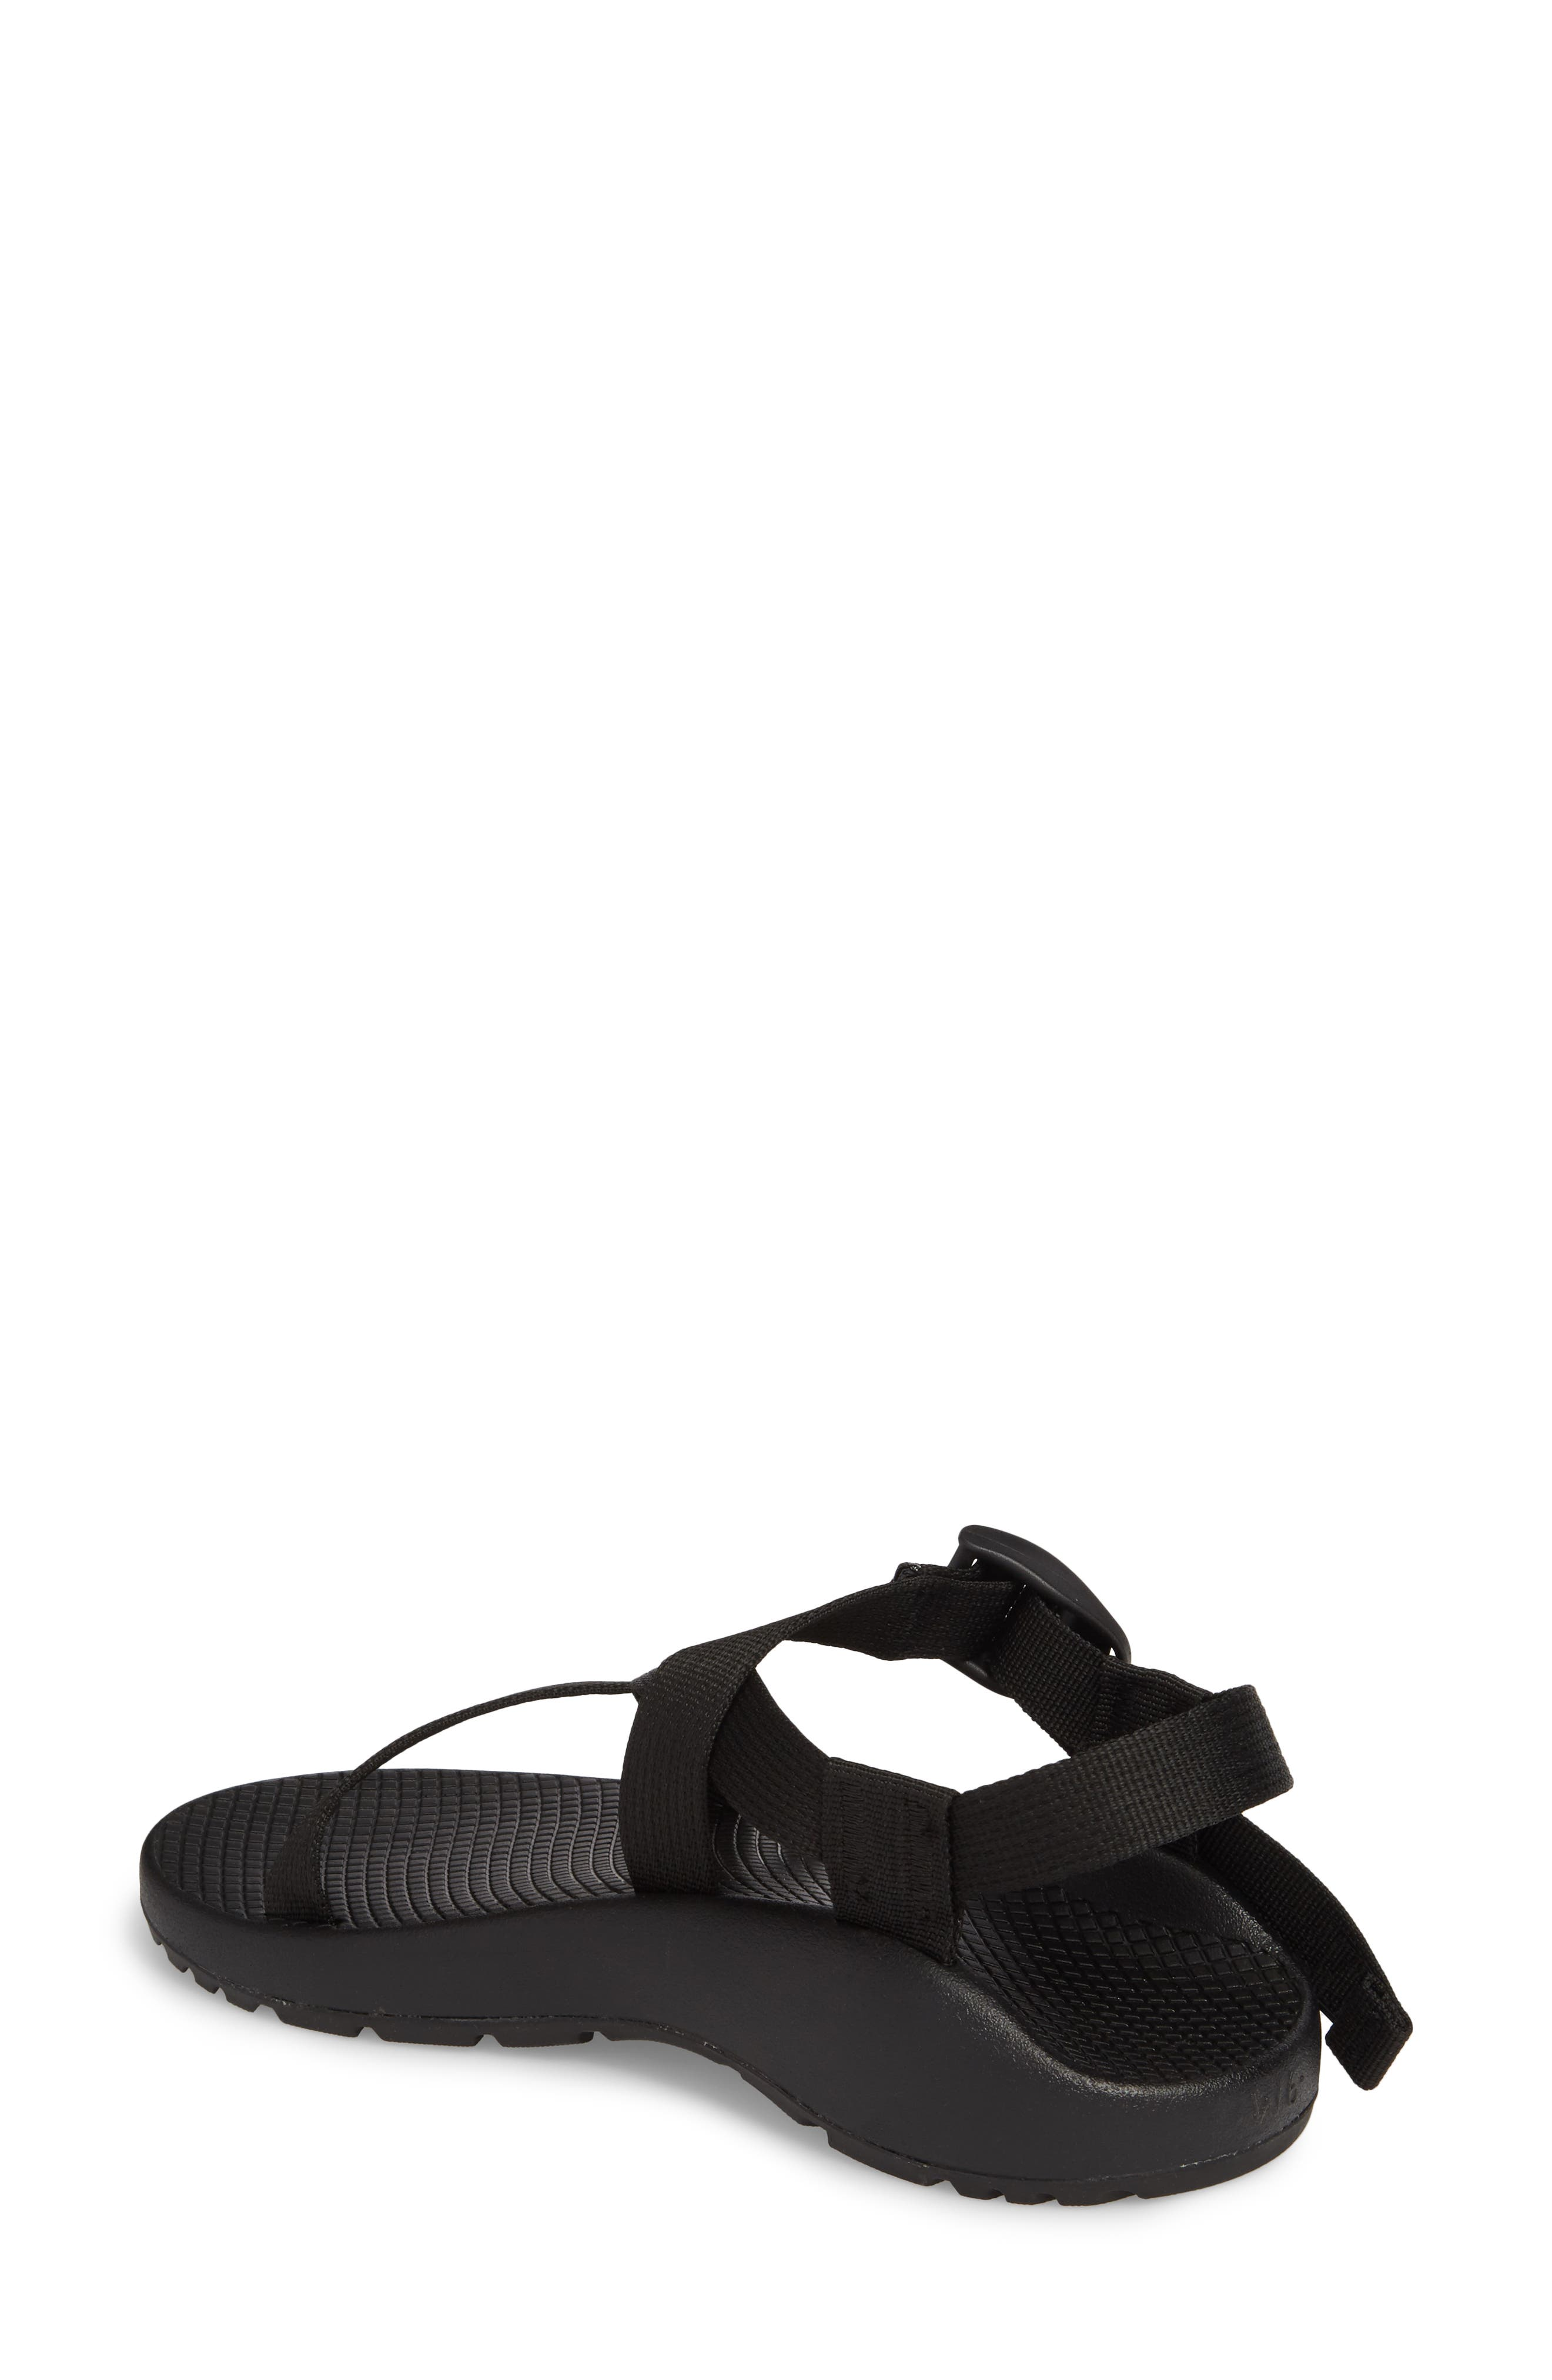 Alternate Image 2  - Chaco Z/1 Classic Sport Sandal (Women)